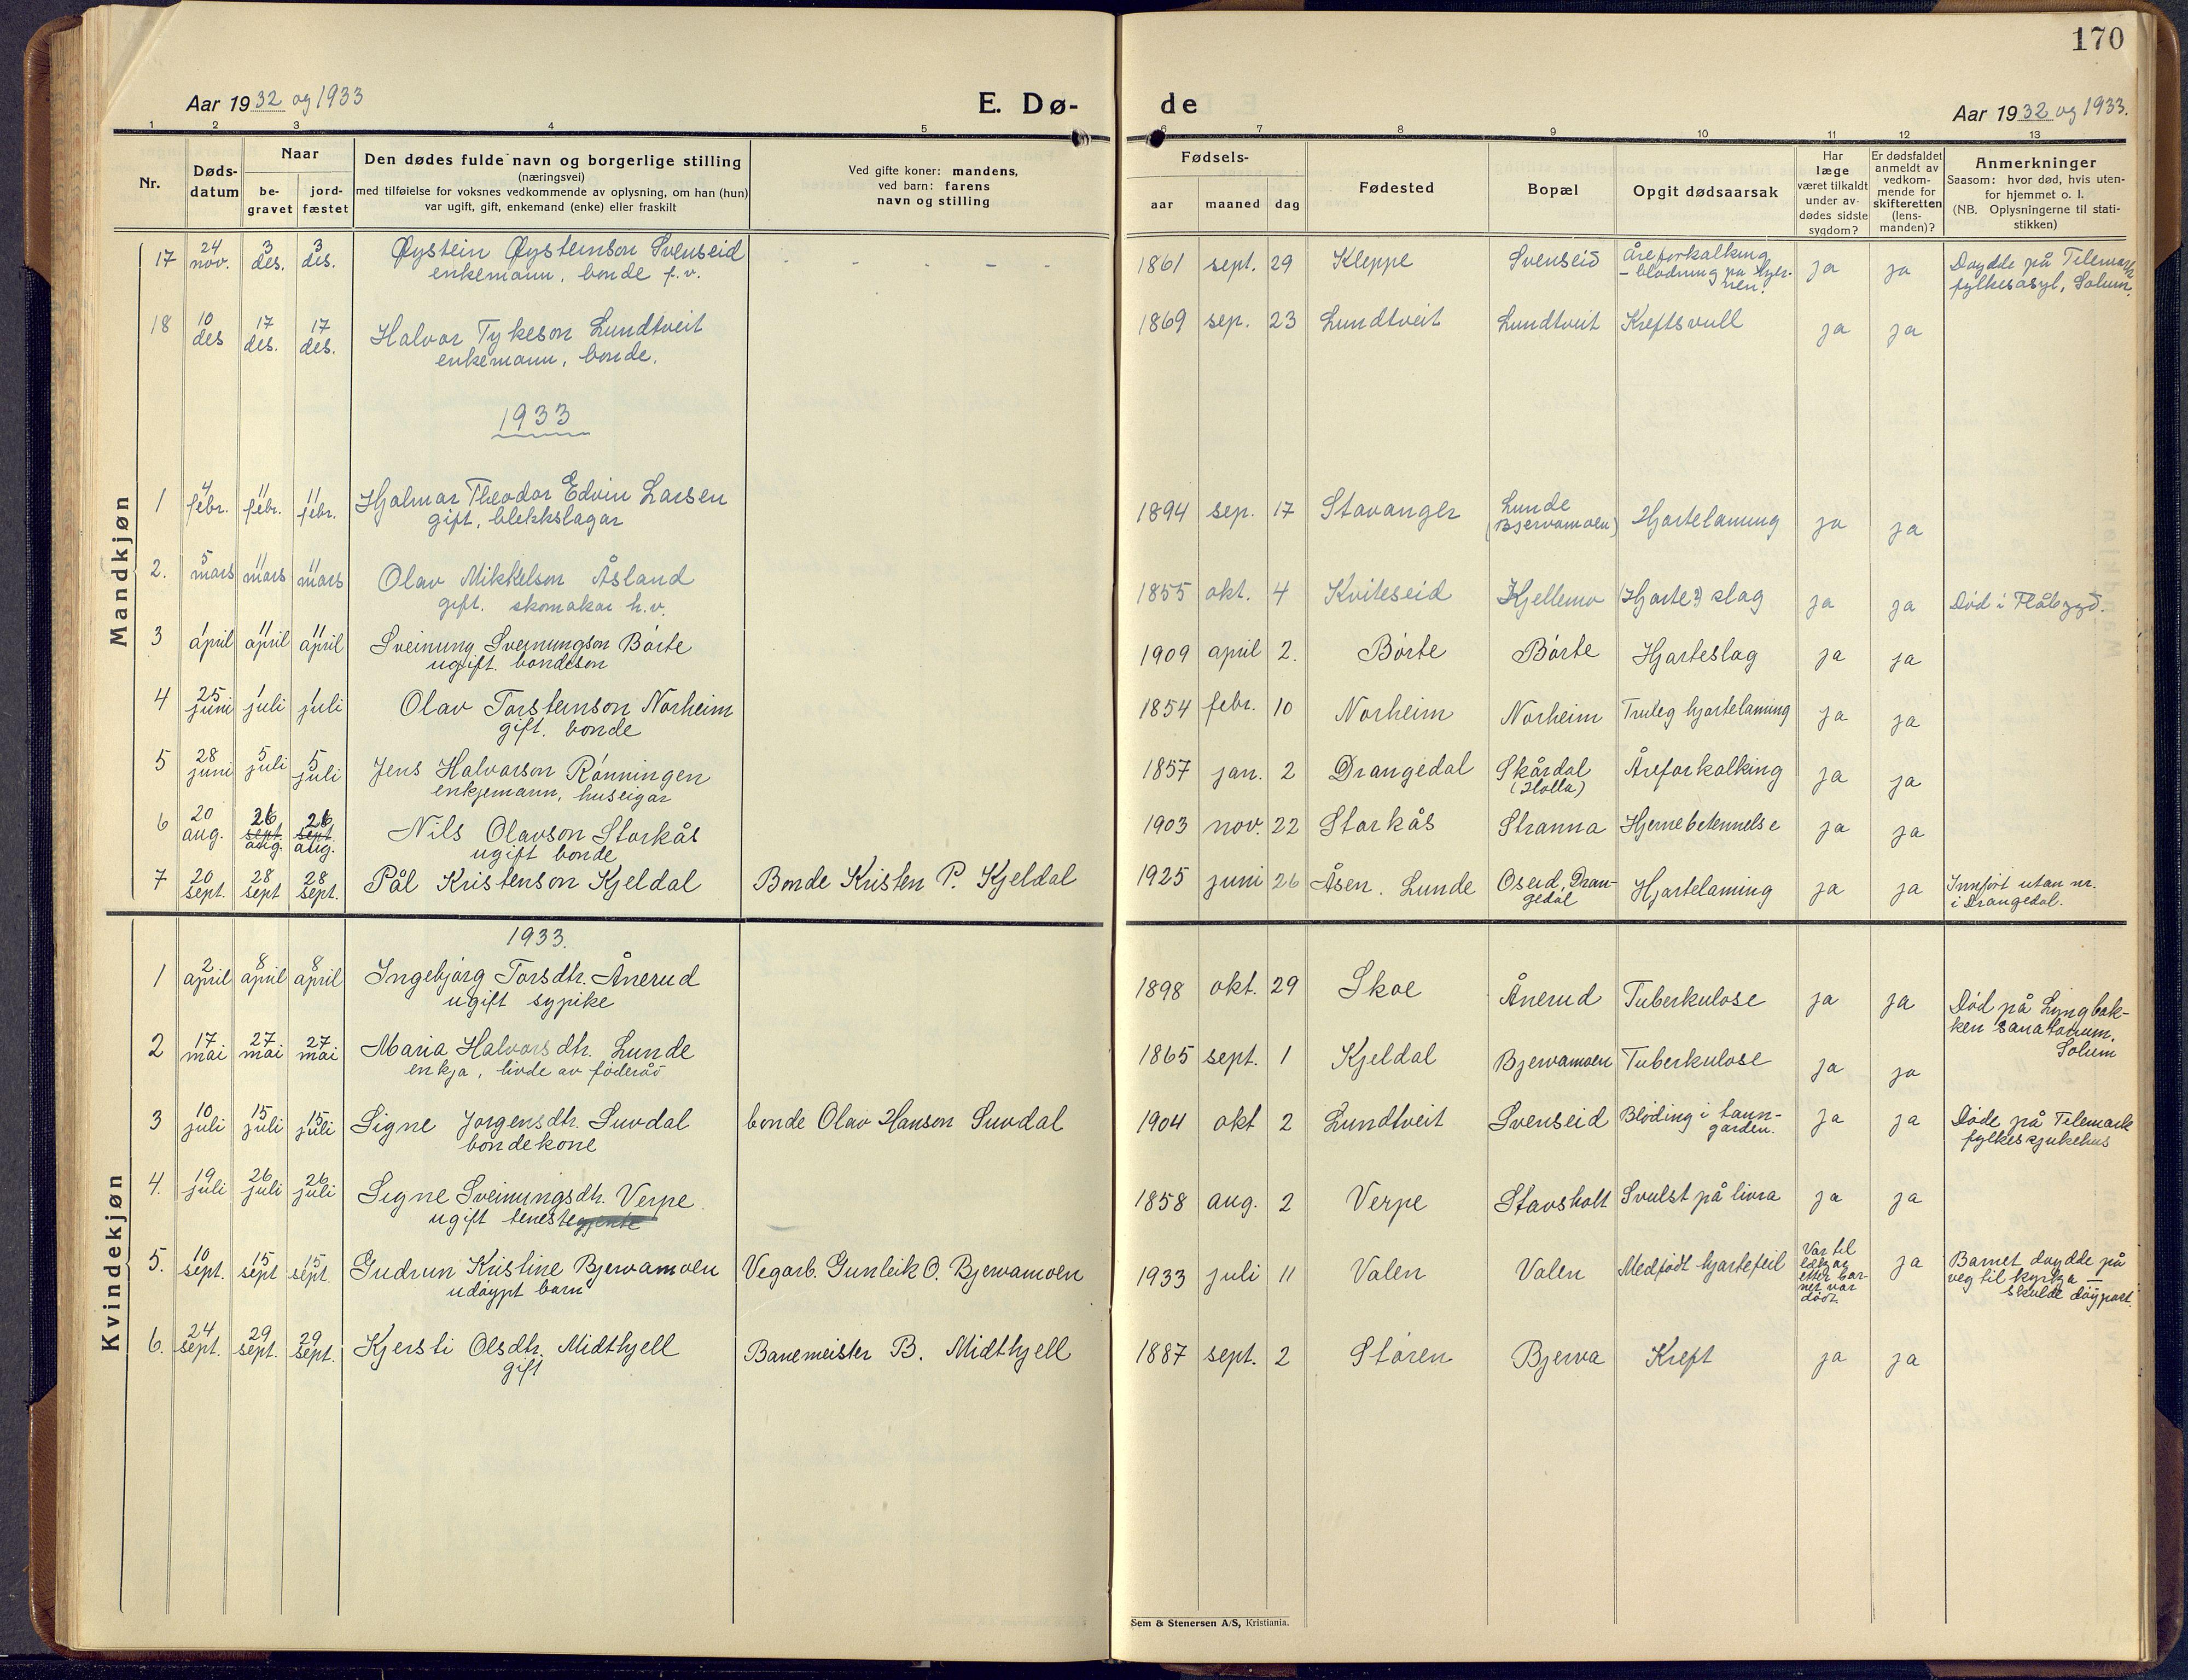 SAKO, Lunde kirkebøker, F/Fa/L0006: Ministerialbok nr. I 6, 1922-1940, s. 170